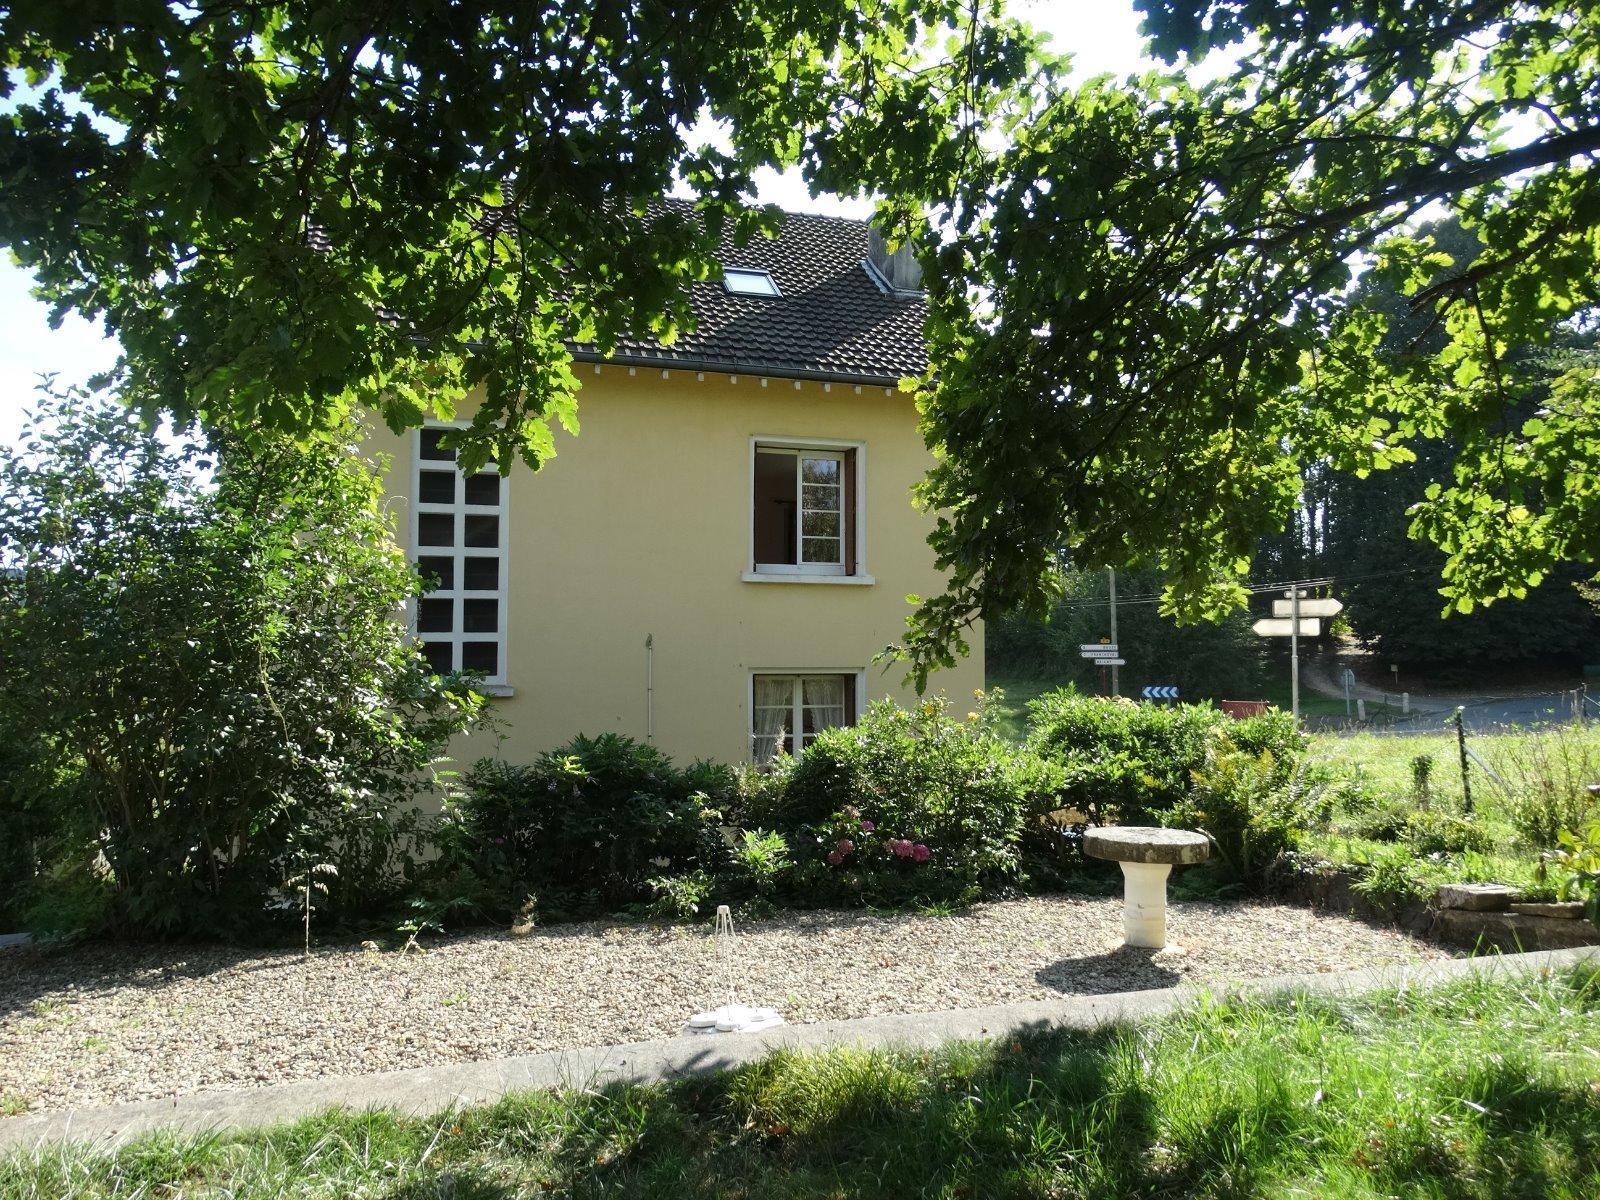 Achat villers cernay maison individuelle turenne immo for Achat maison individuelle wittenheim